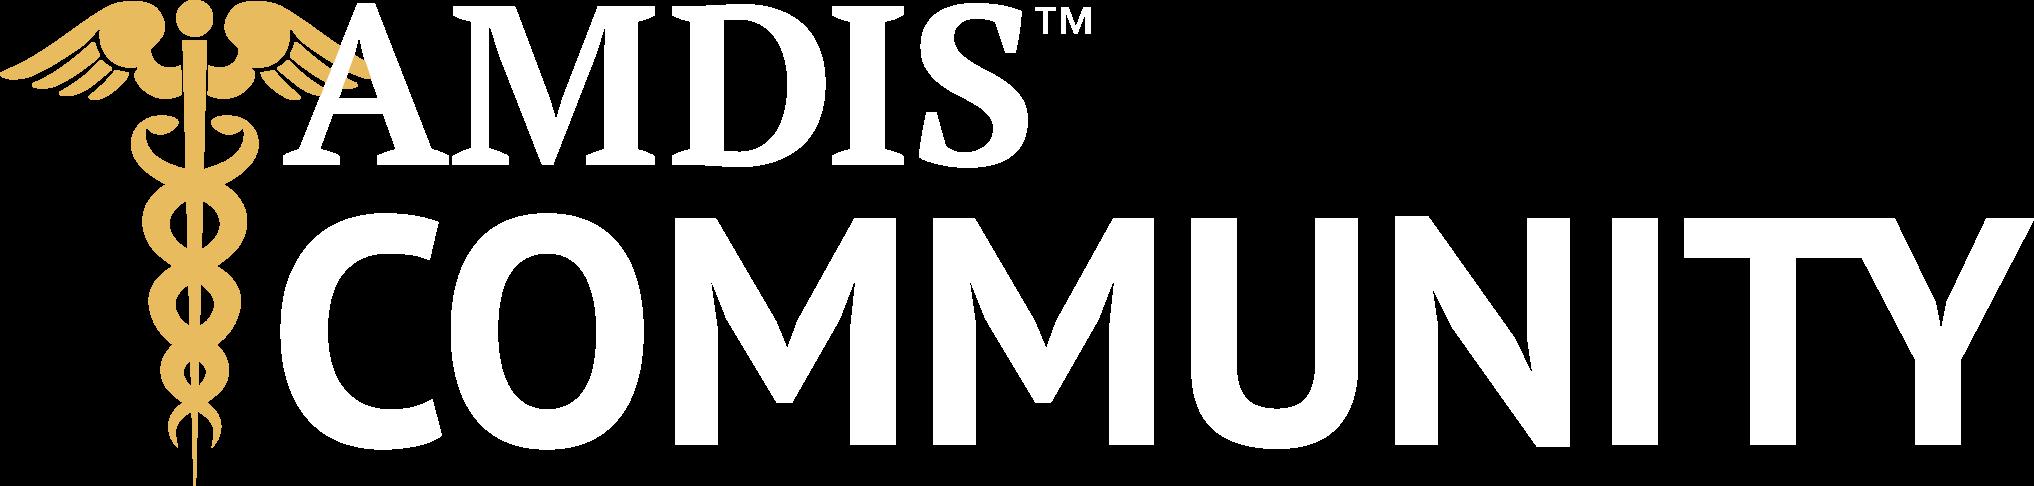 AMDIS Community